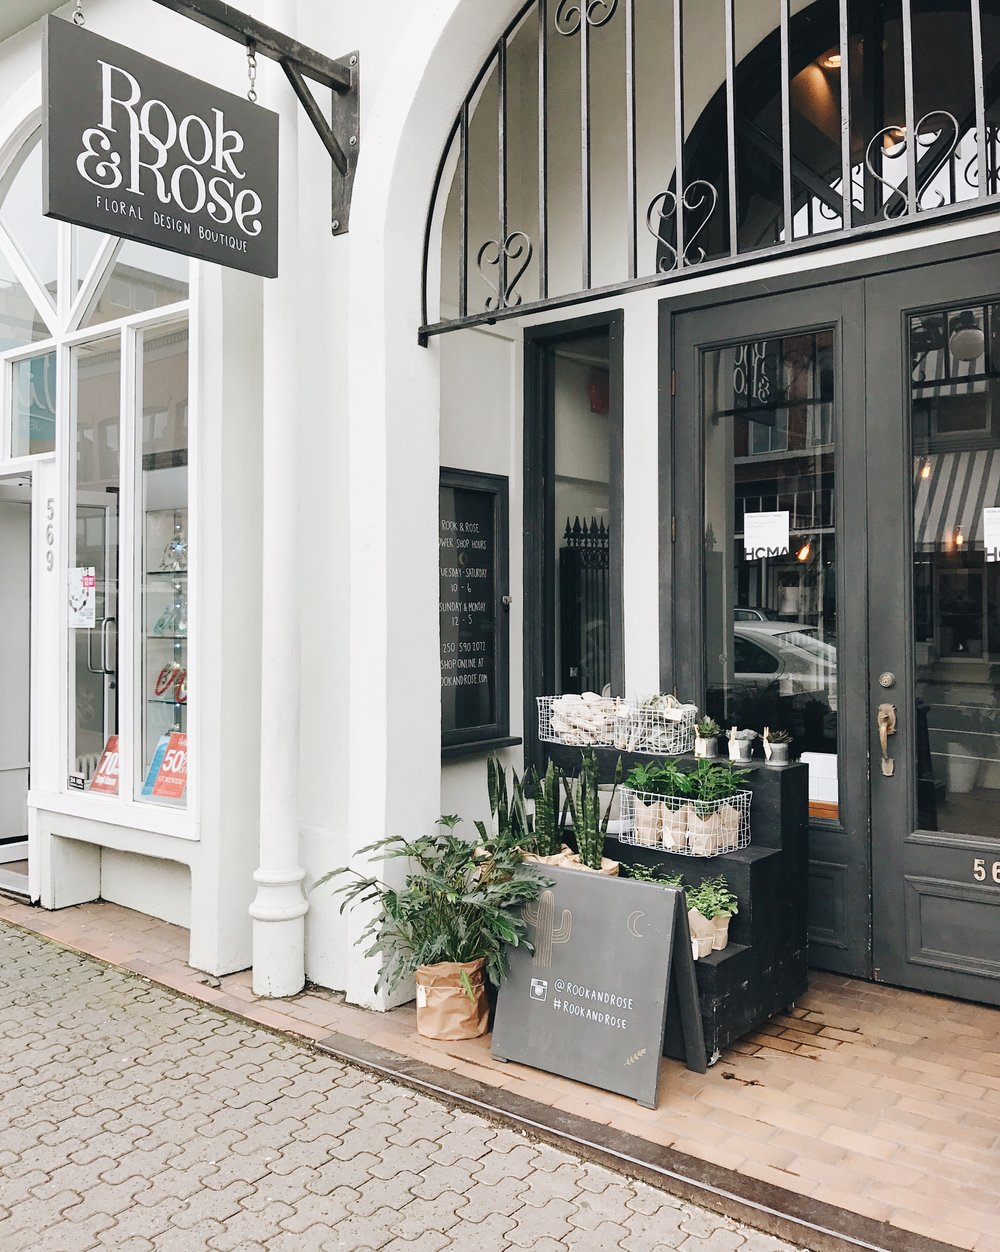 Rook & Rose, Victoria BC, Nyla Free Designs Inc